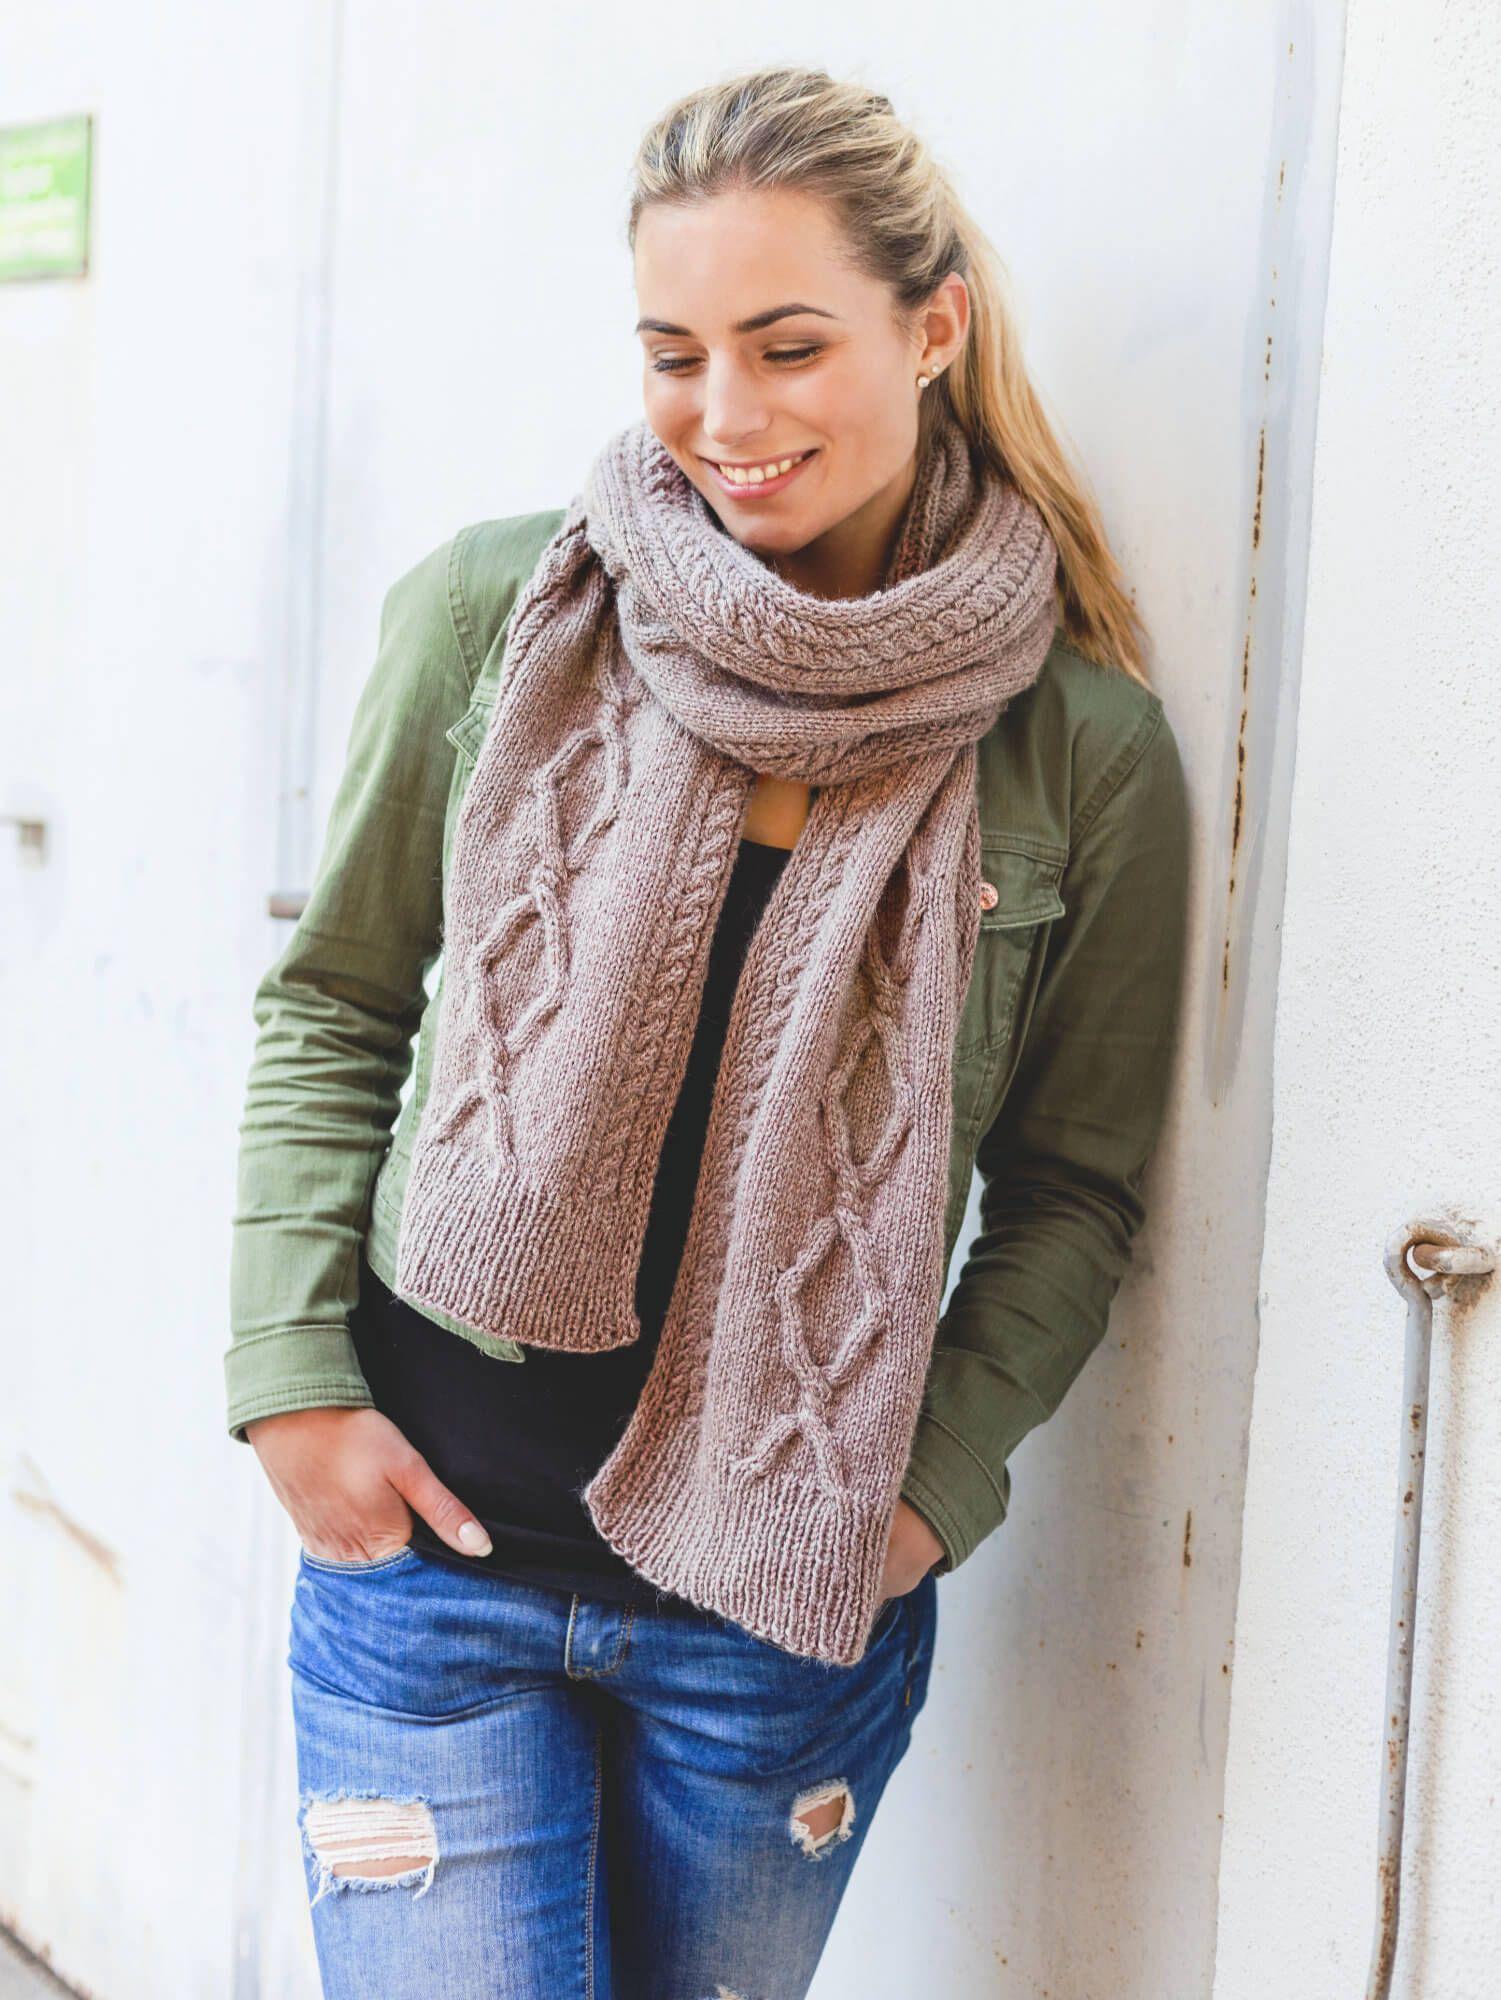 Zopf Schal Im Mustermix Stricken Pinterest Knitting Crochet